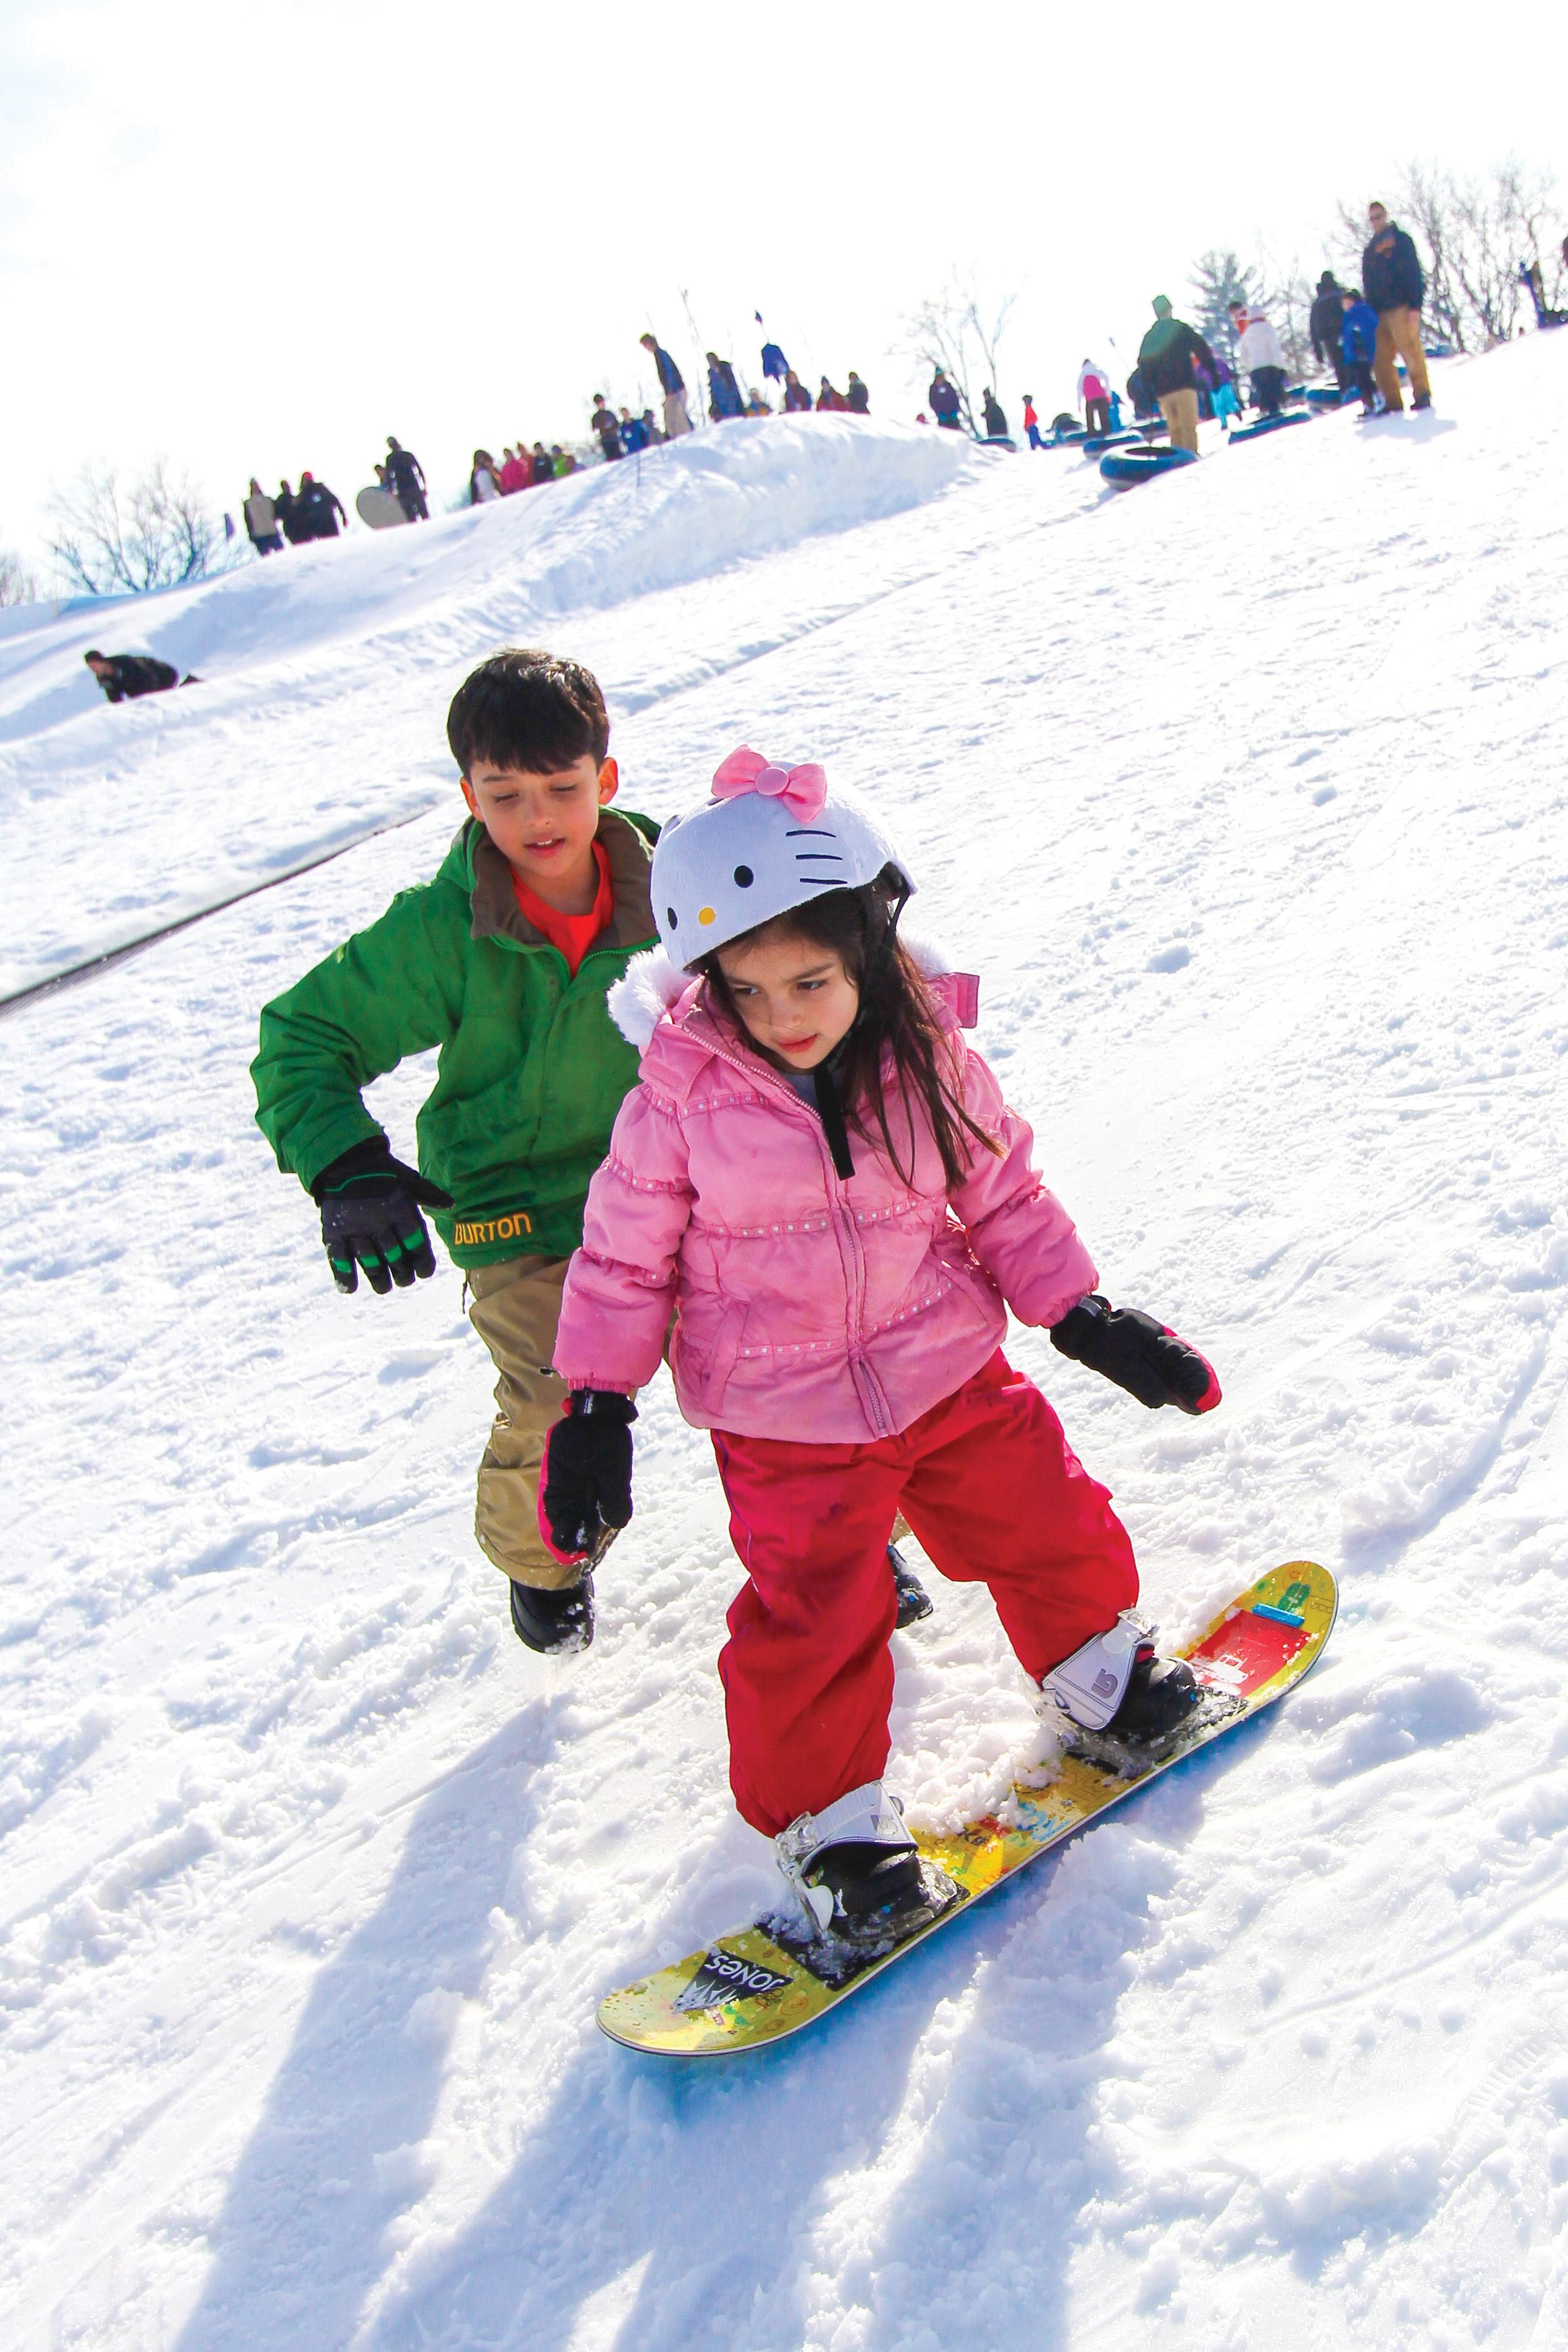 Snowboarding-02_WEB.jpg